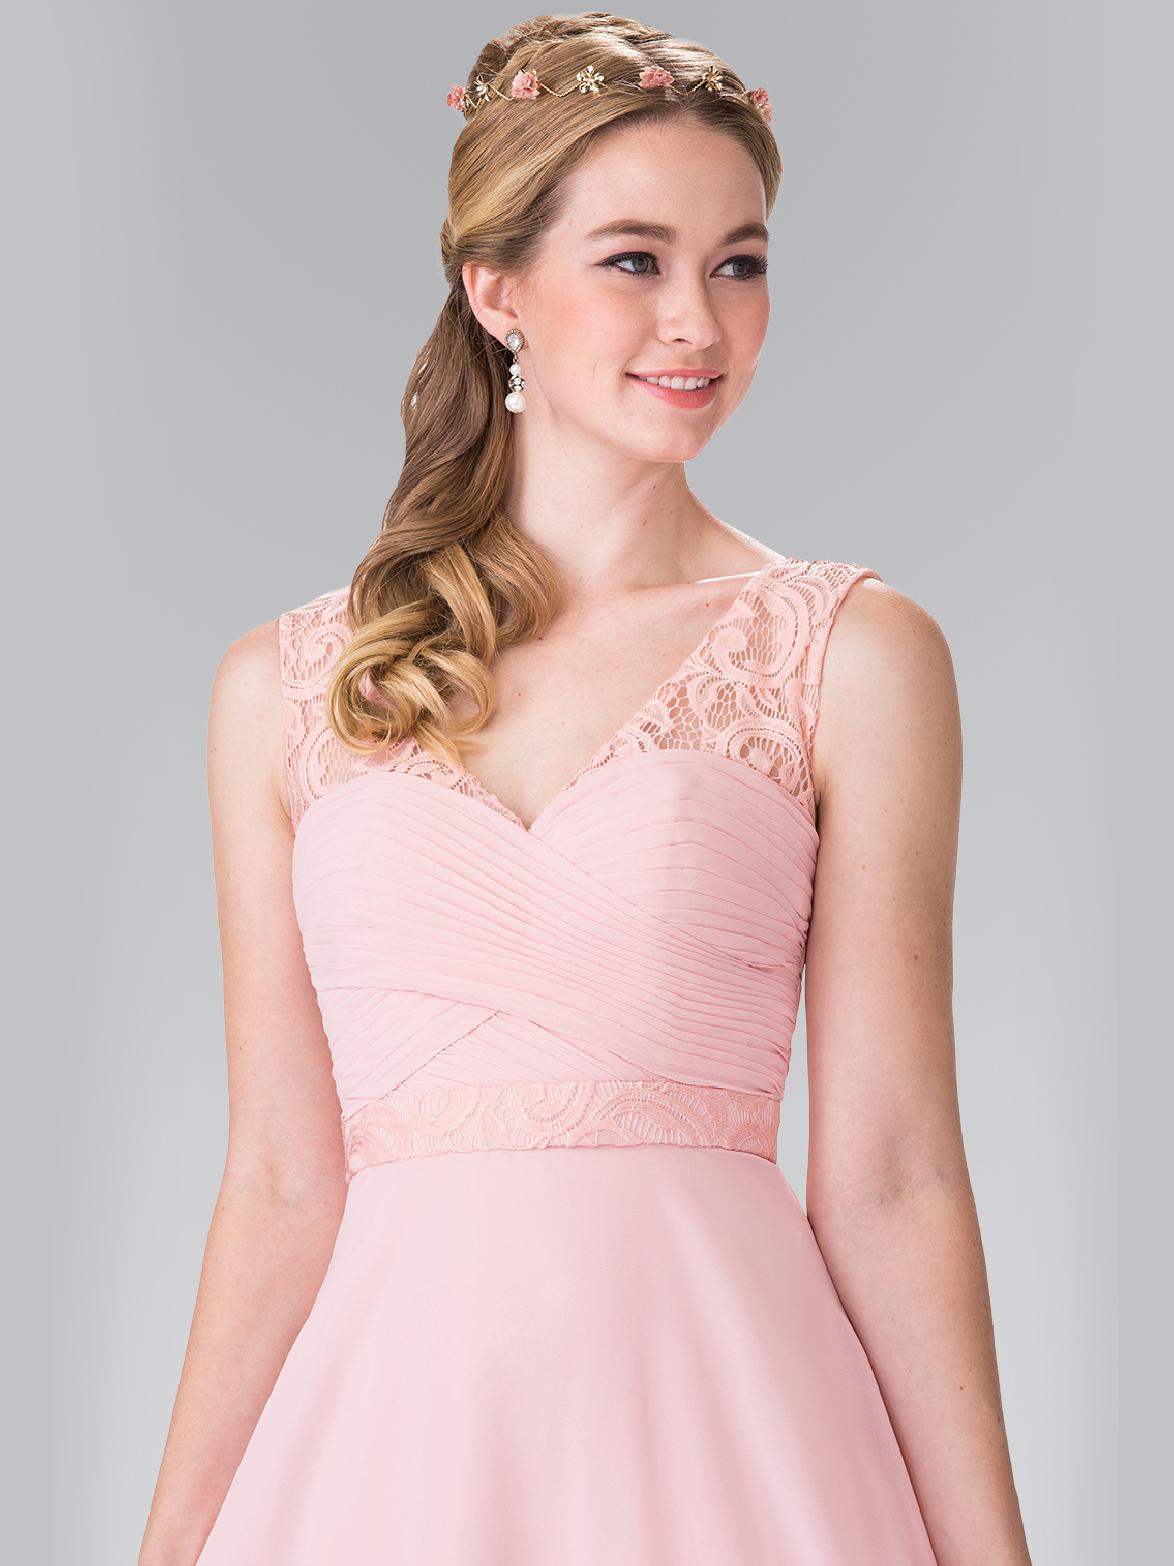 Chiffon bridesmaid dresses with lace straps sung boutique la 50 2363 chiffon bridesmaid dresses with lace straps blush back view medium ombrellifo Gallery